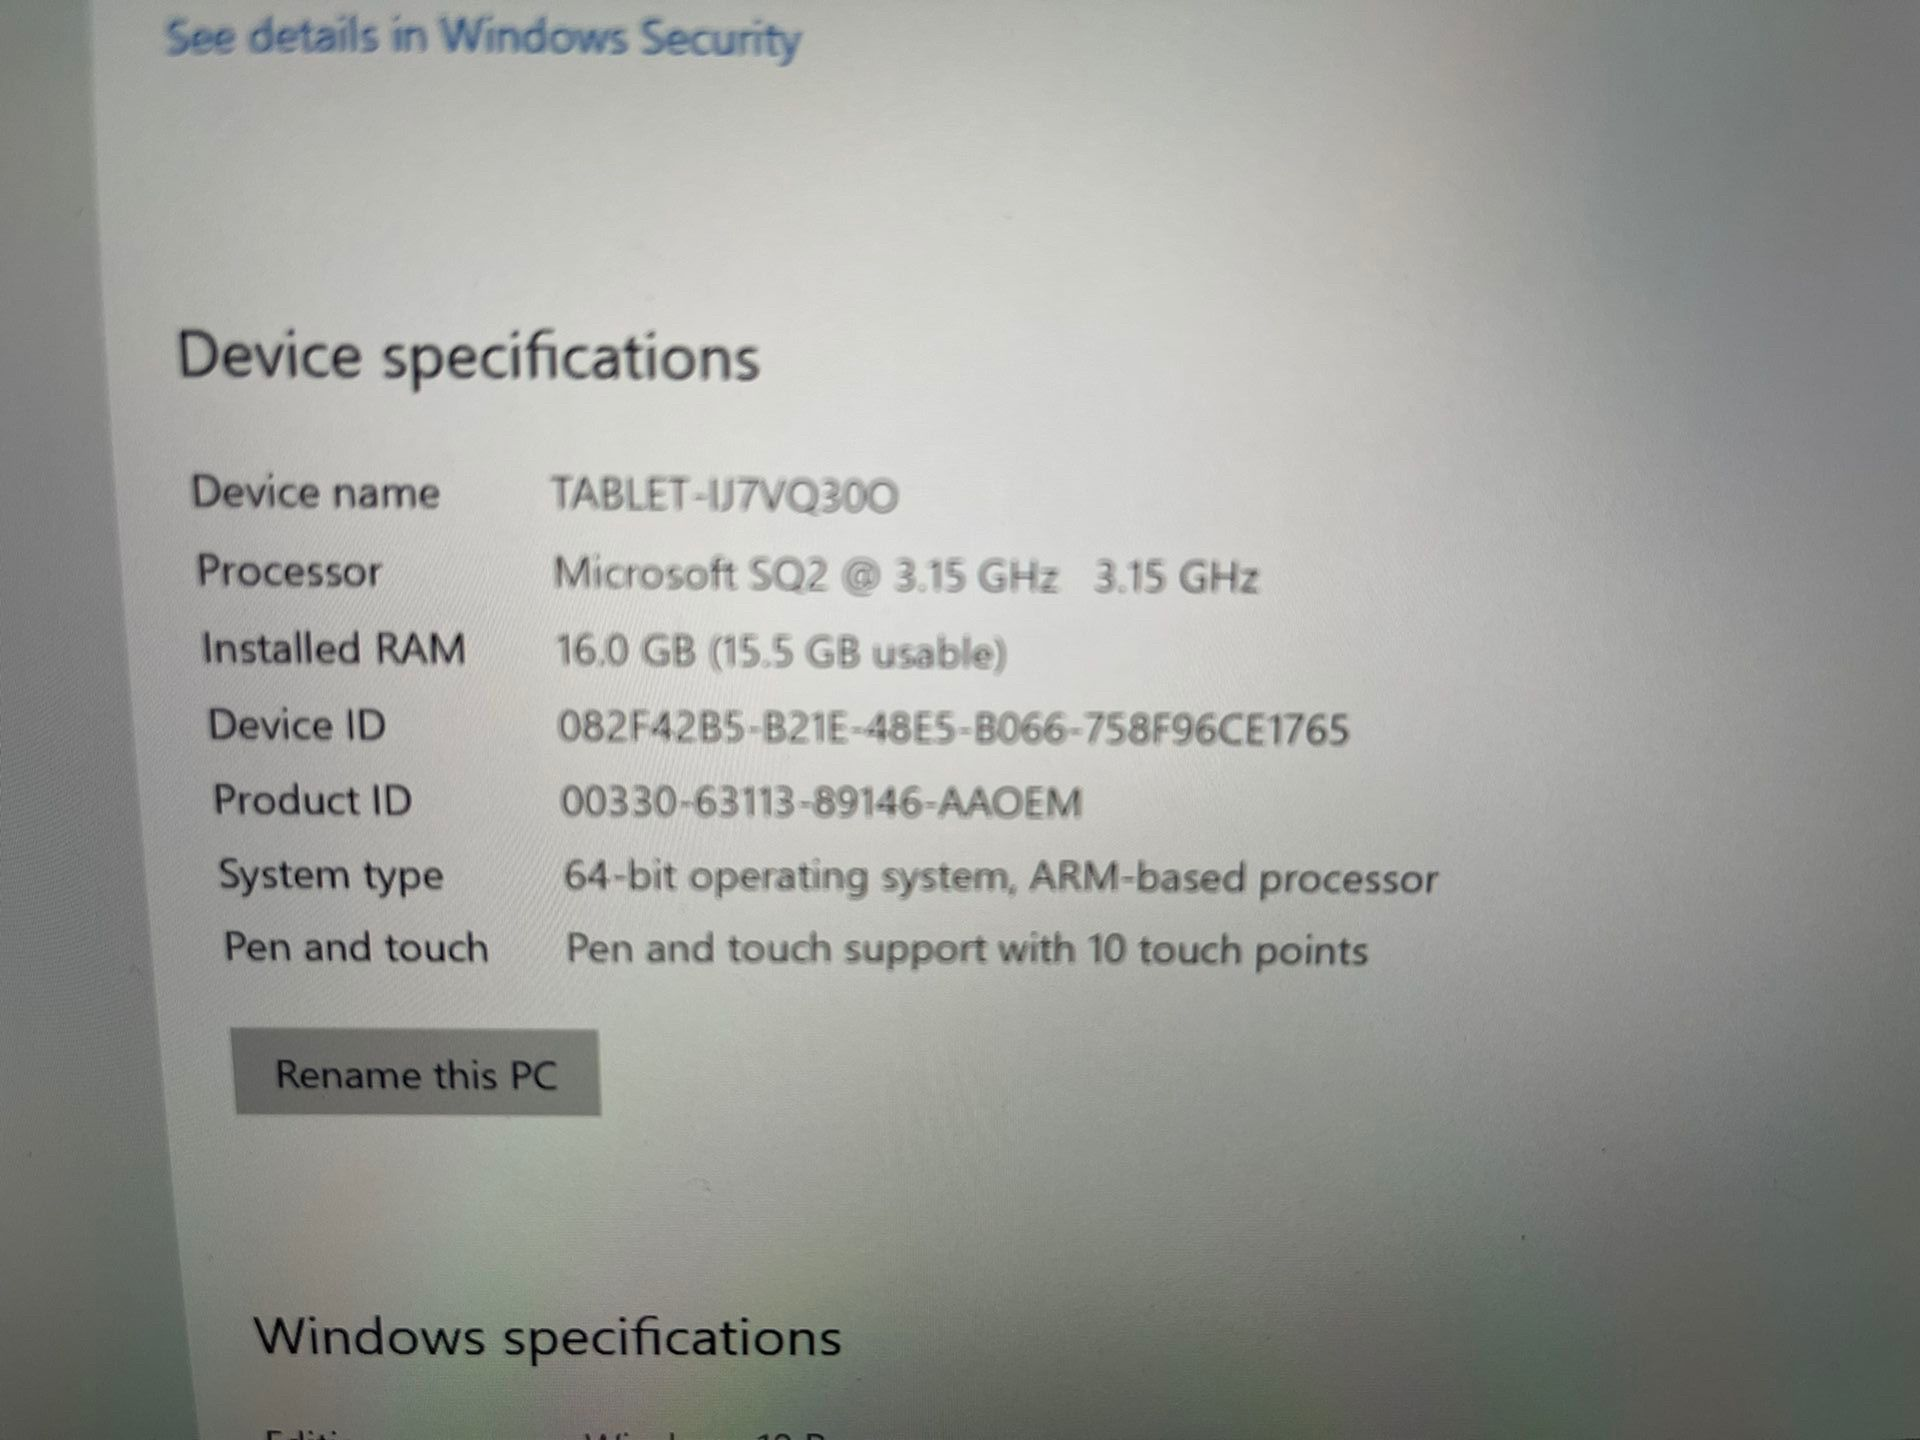 Surface Pro X, SQ2 CPU/16GB/512GB/Cellular LTE/Keyboard/Pen/Warranty+